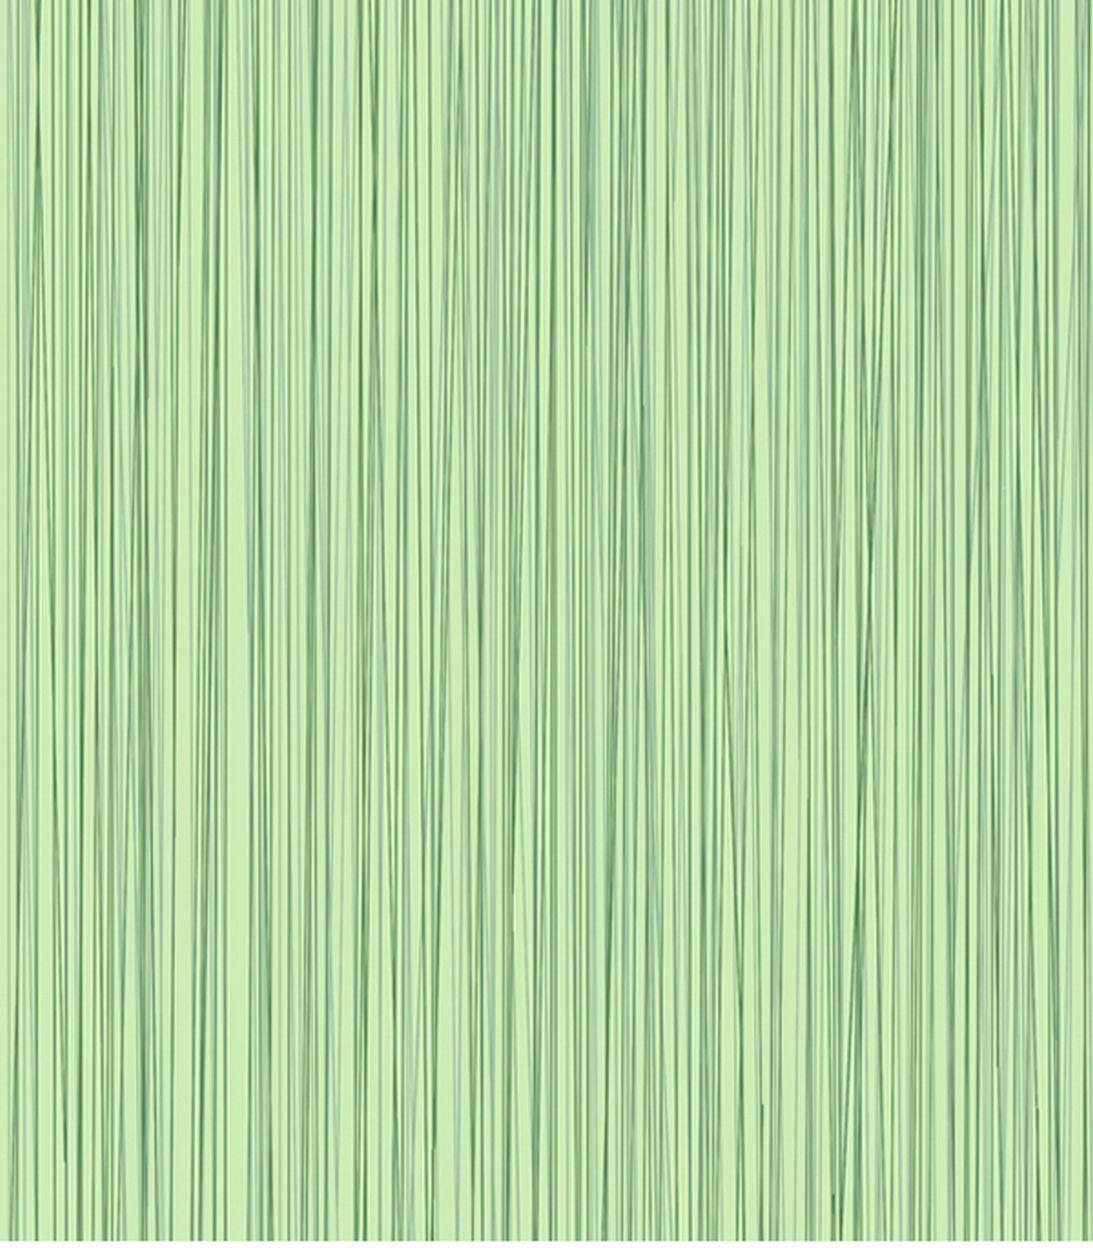 цена на Плитка облицовочная Cersanit Light зеленая 200x300x7 мм (20 шт.=1,2 кв.м)